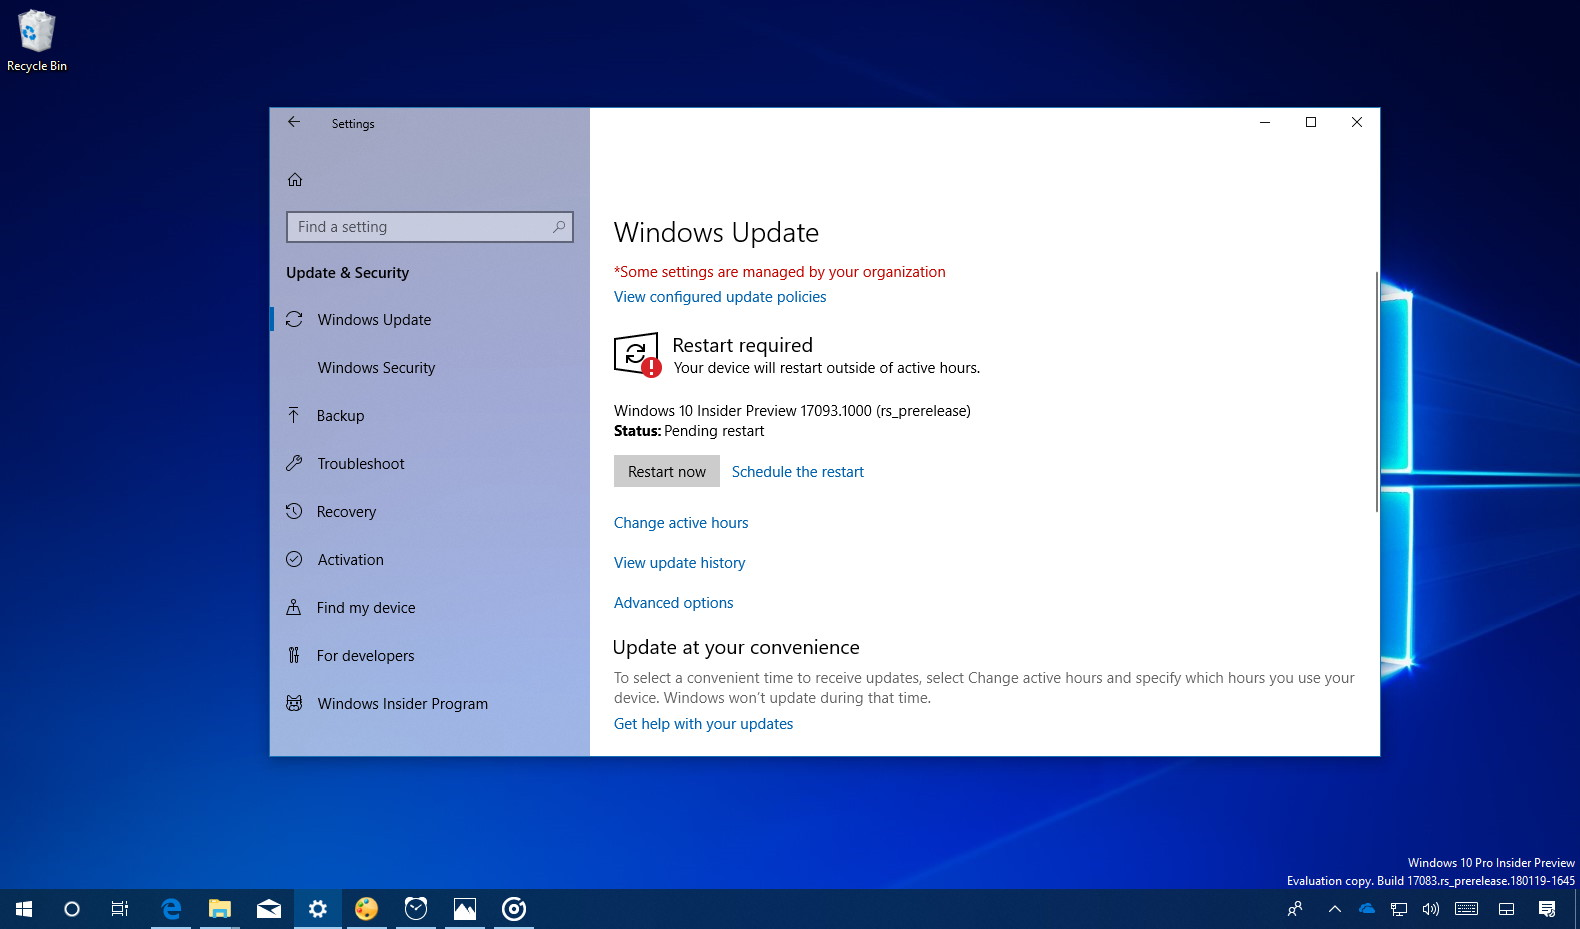 Windows 10 build 17093